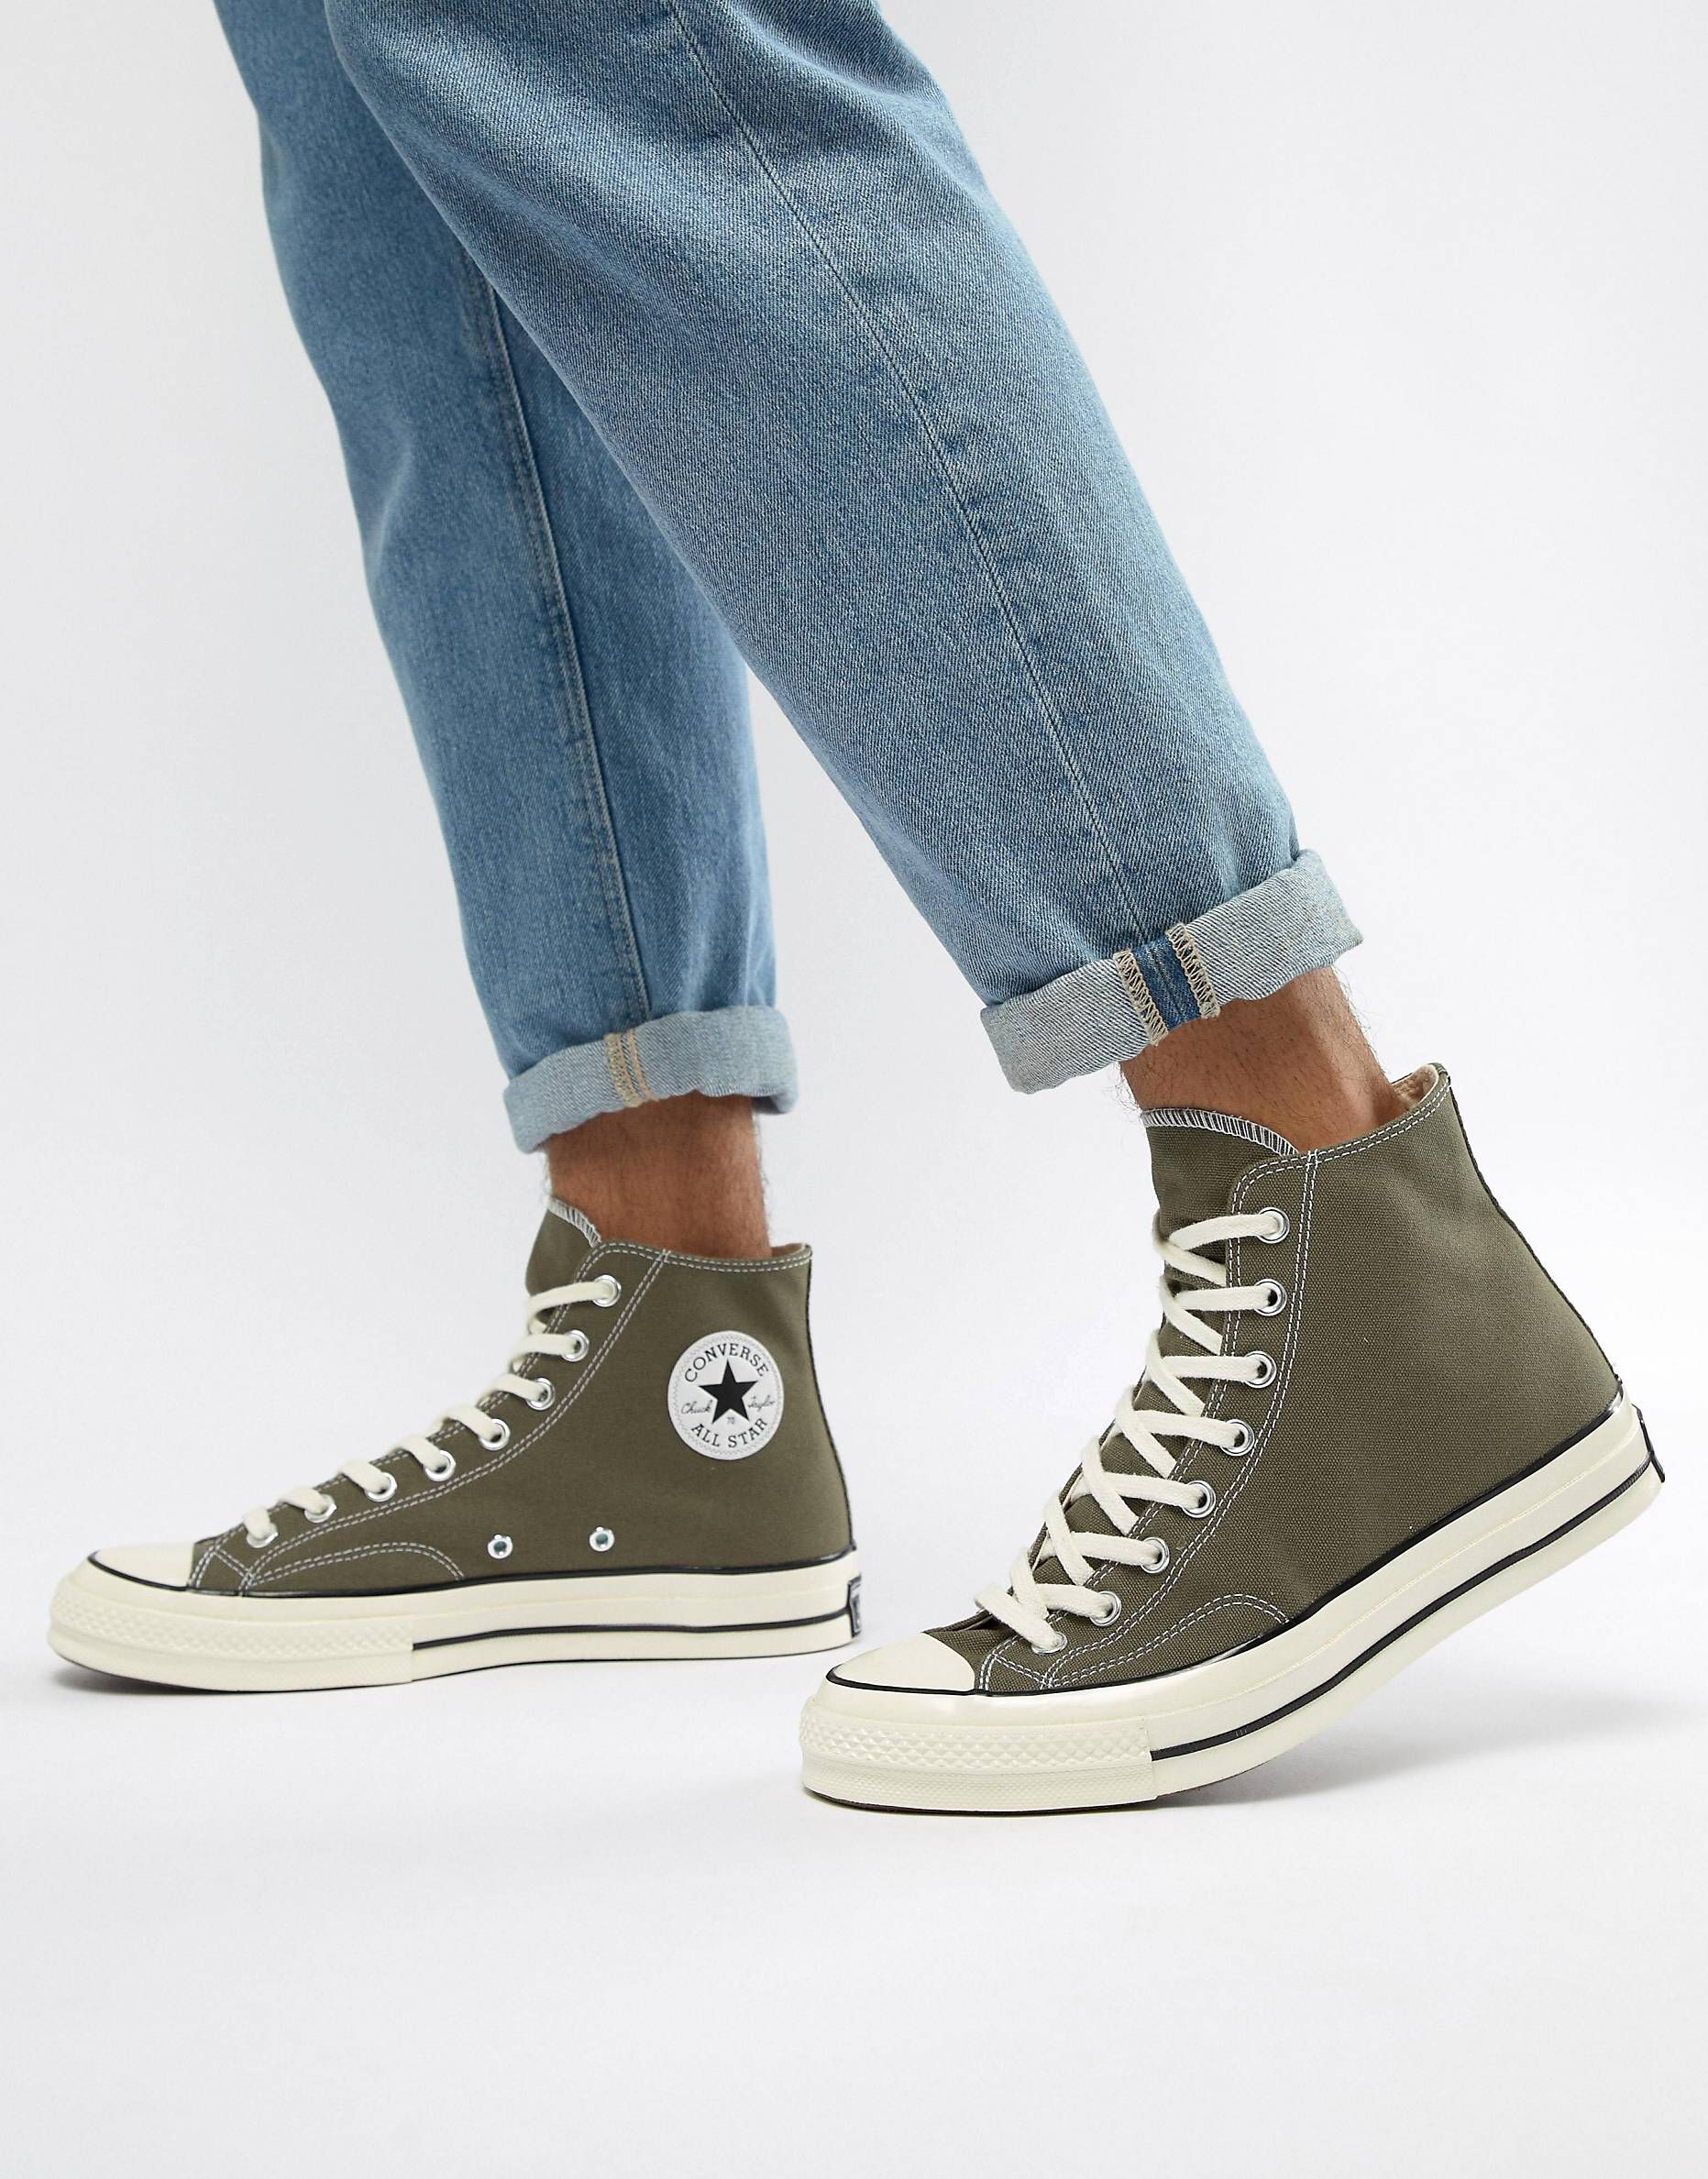 converse verte kaki